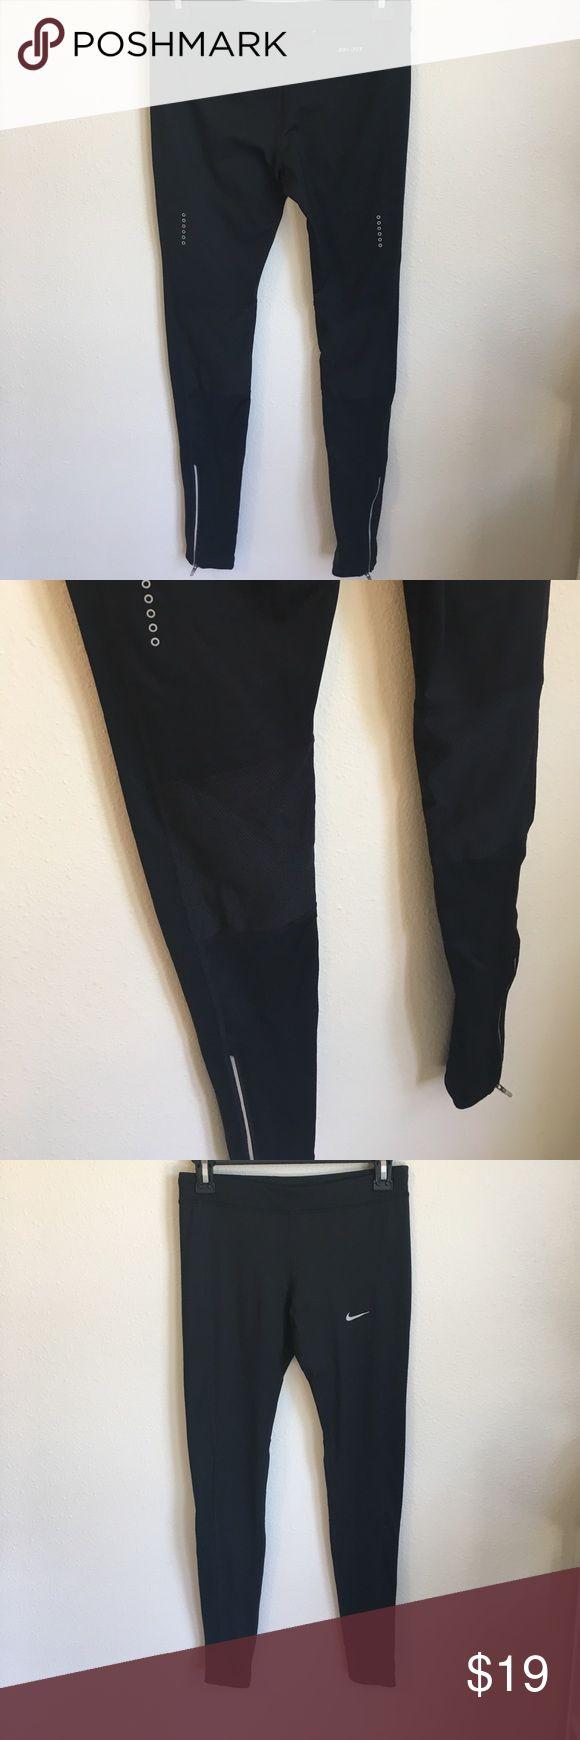 Nike Full Length Running Tights Nike Pro black full length women's running tights. Mesh on back of knees, zipper ankles and reflective. Pocket on back. Never been worn. Nike Pants Leggings